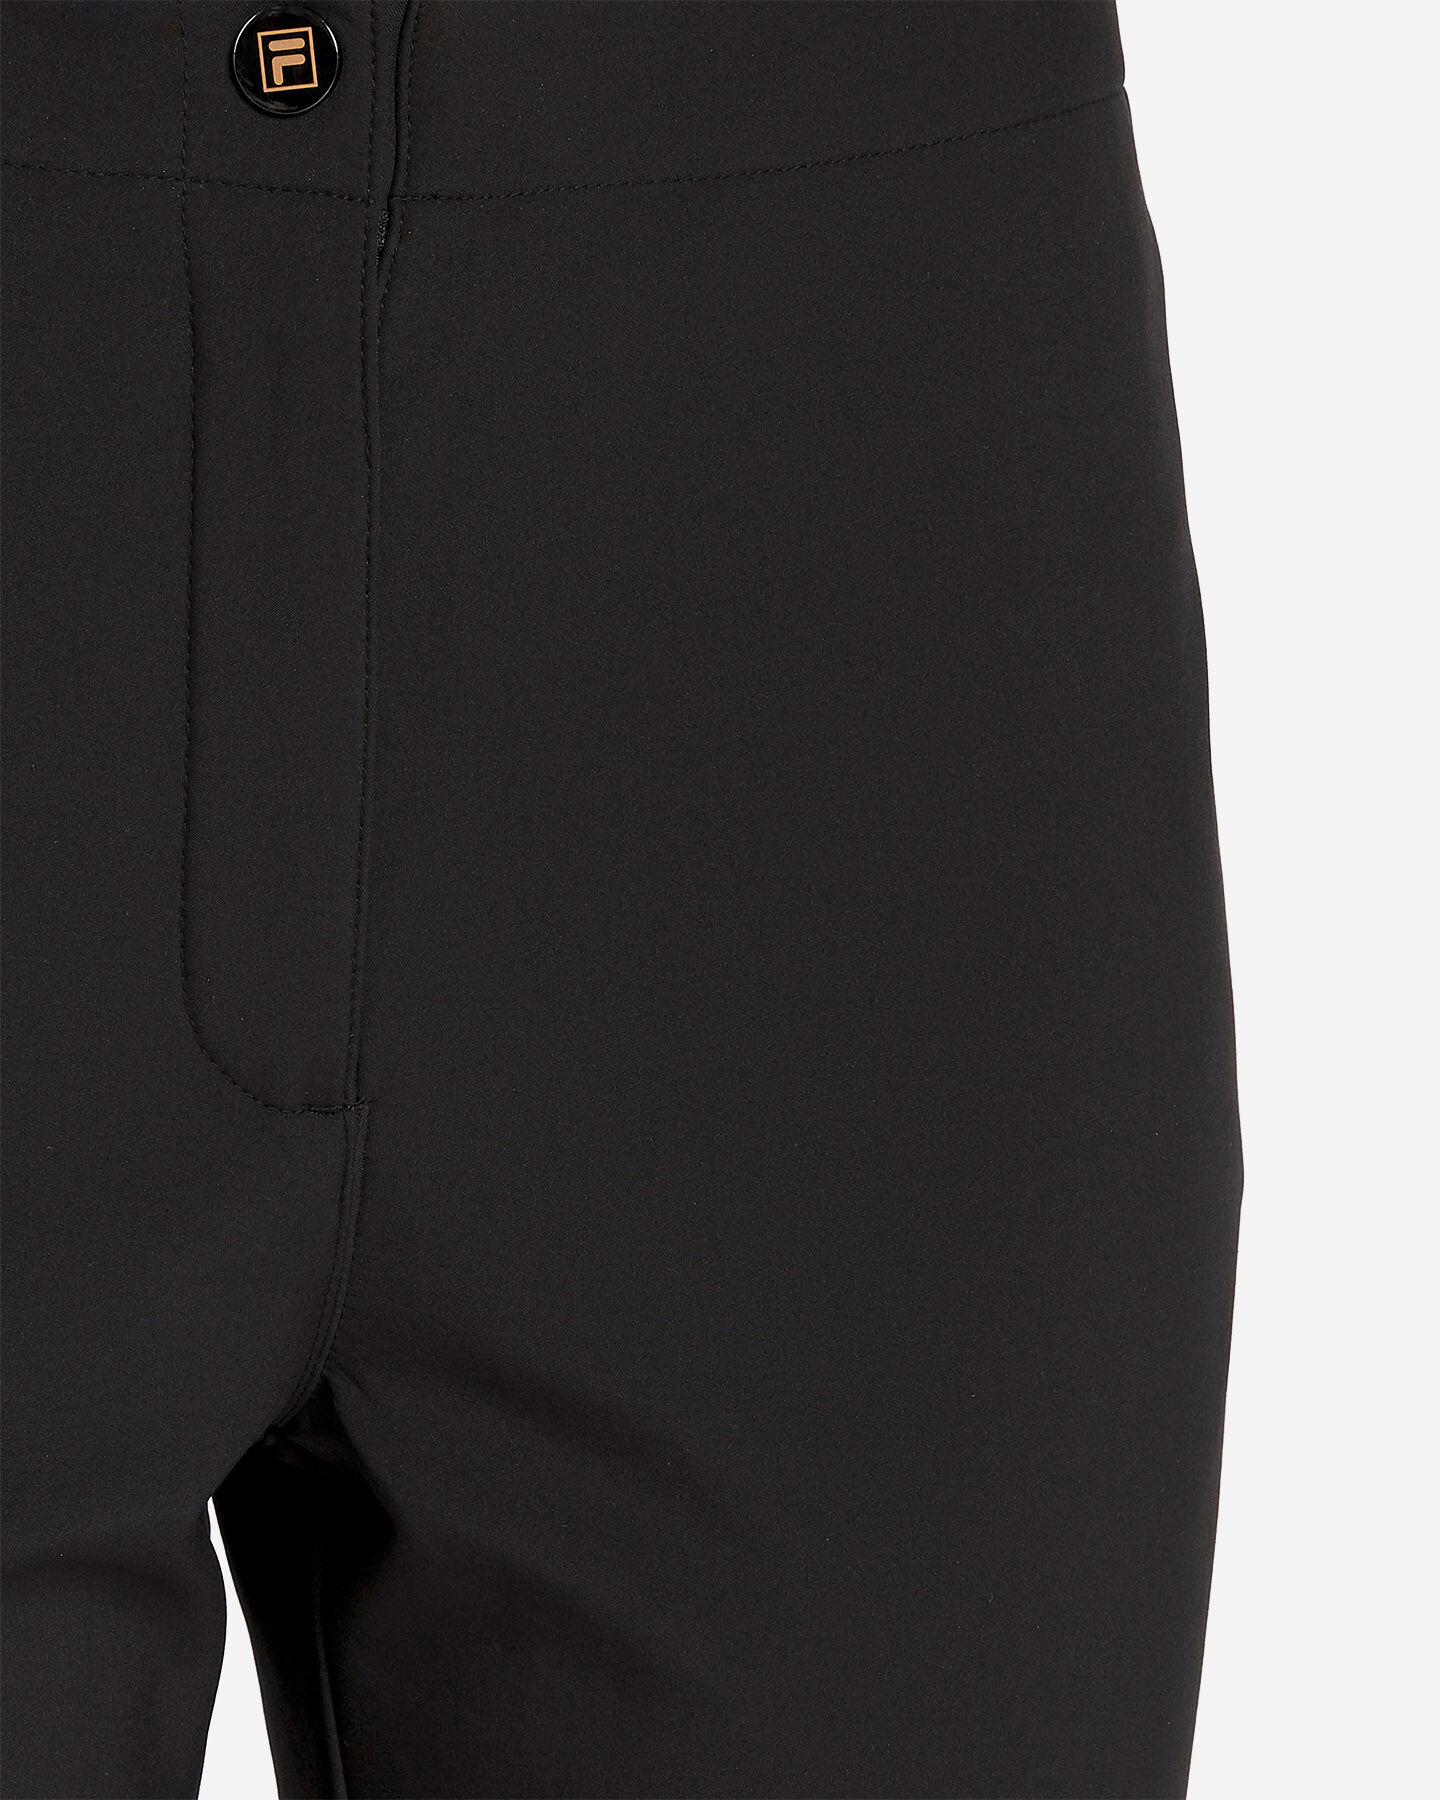 Pantalone sci FILA SKI SS PANTS W S4034225 scatto 3